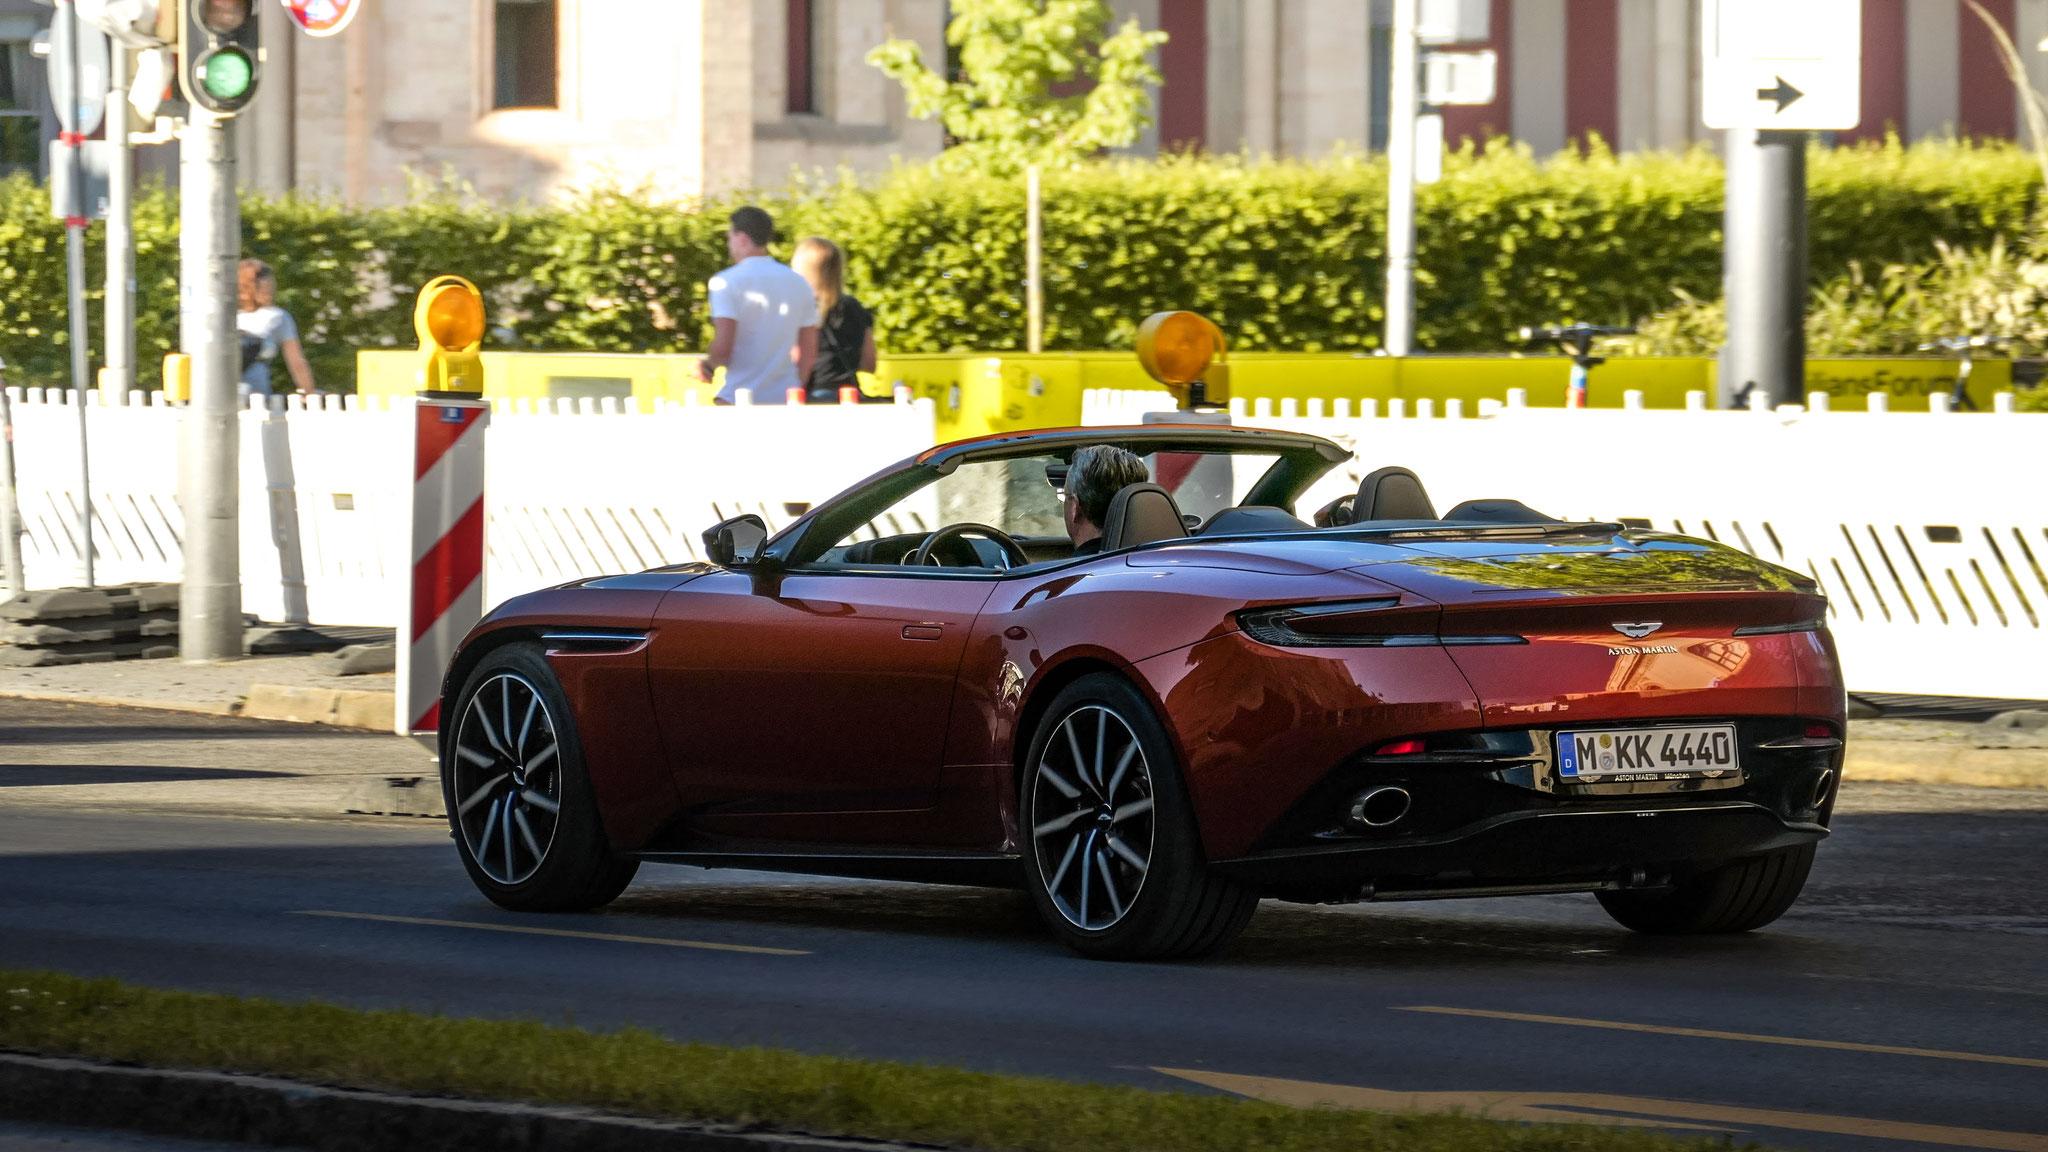 Aston Martin DB11 Volante - M-KK-4440